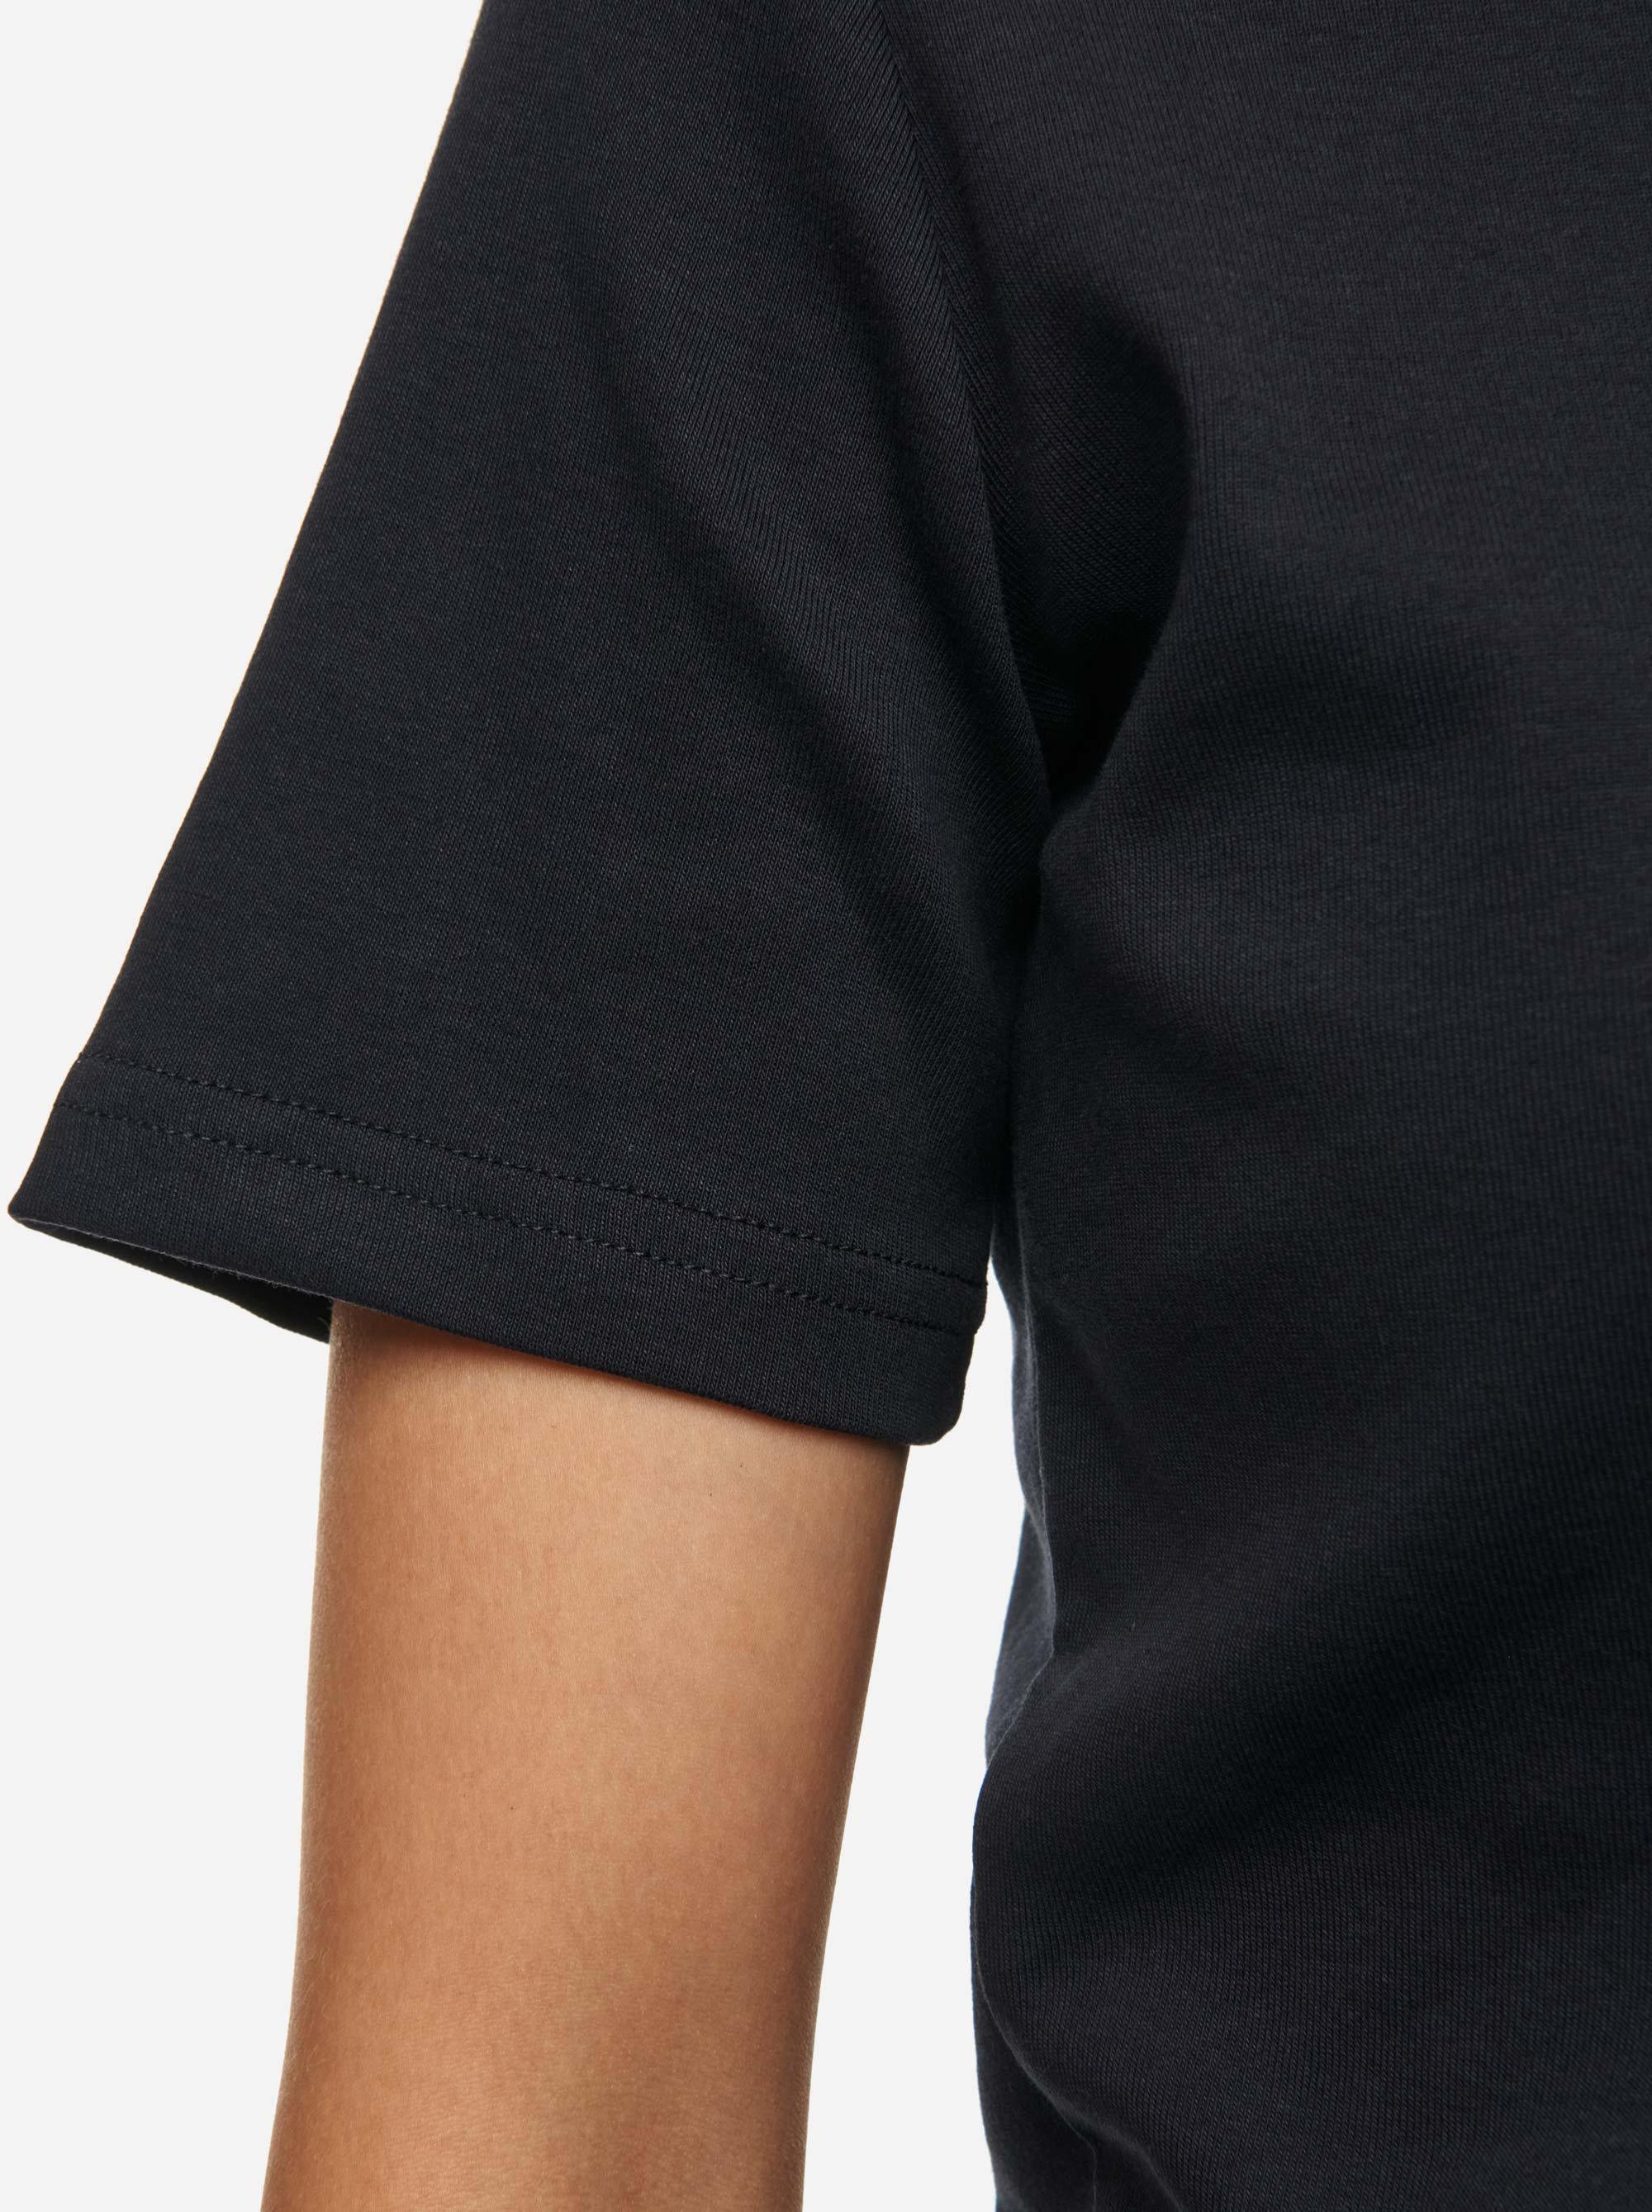 Teym - The T-Shirt - V-Neck - Women - Blue - 5